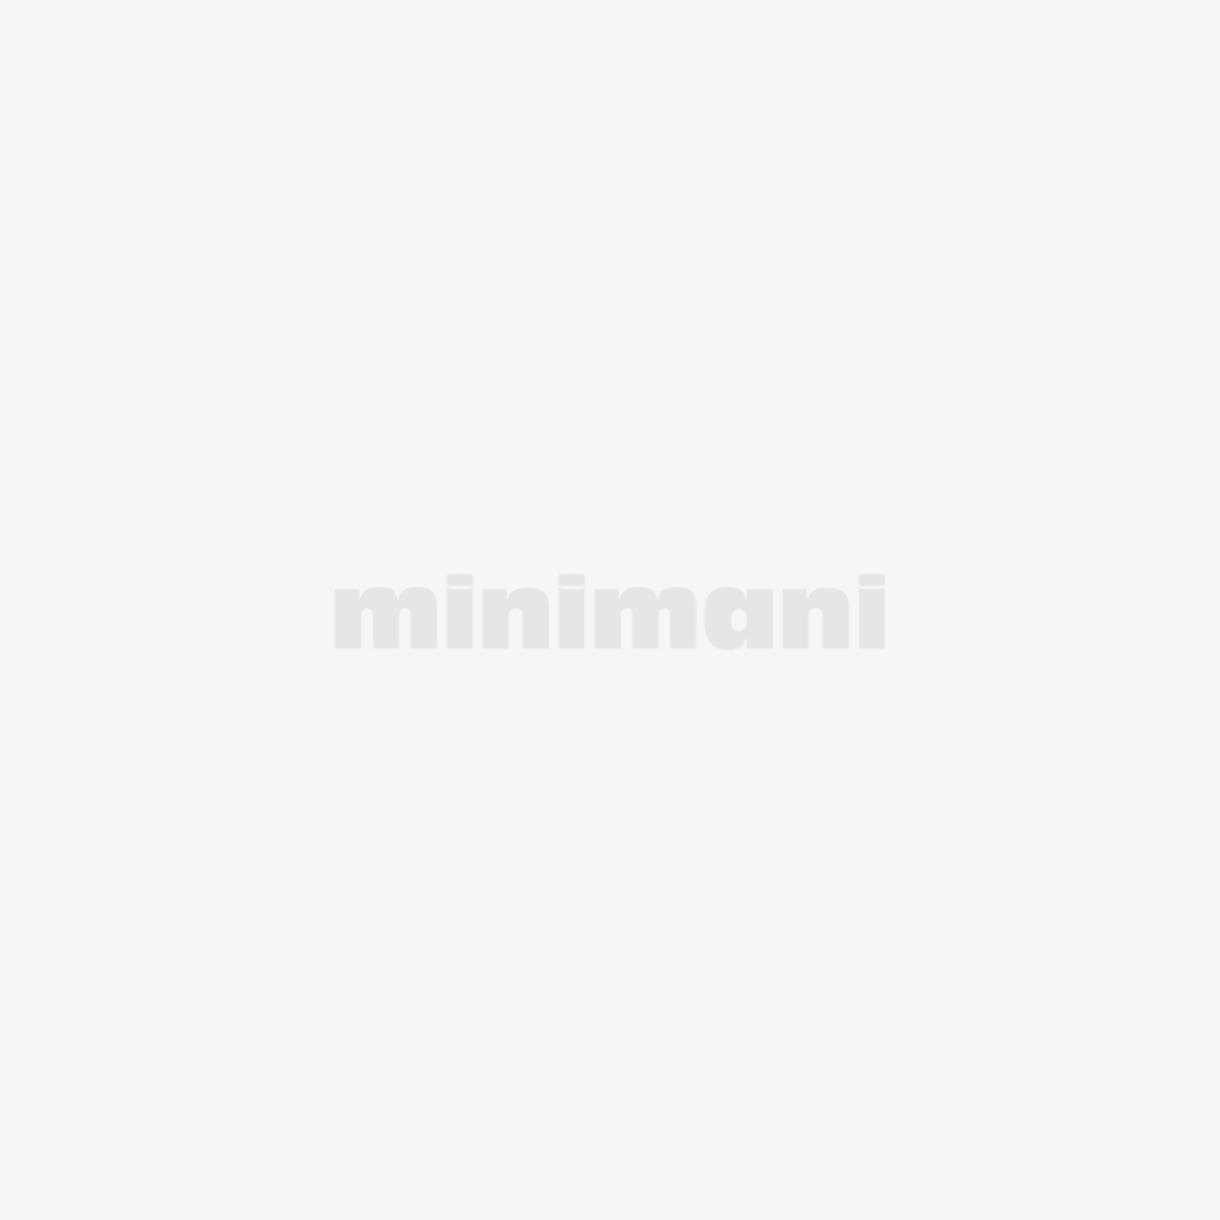 OPAL ANZ578 ASENNUSKAAPELI MK2,5 RUSKEA 25M